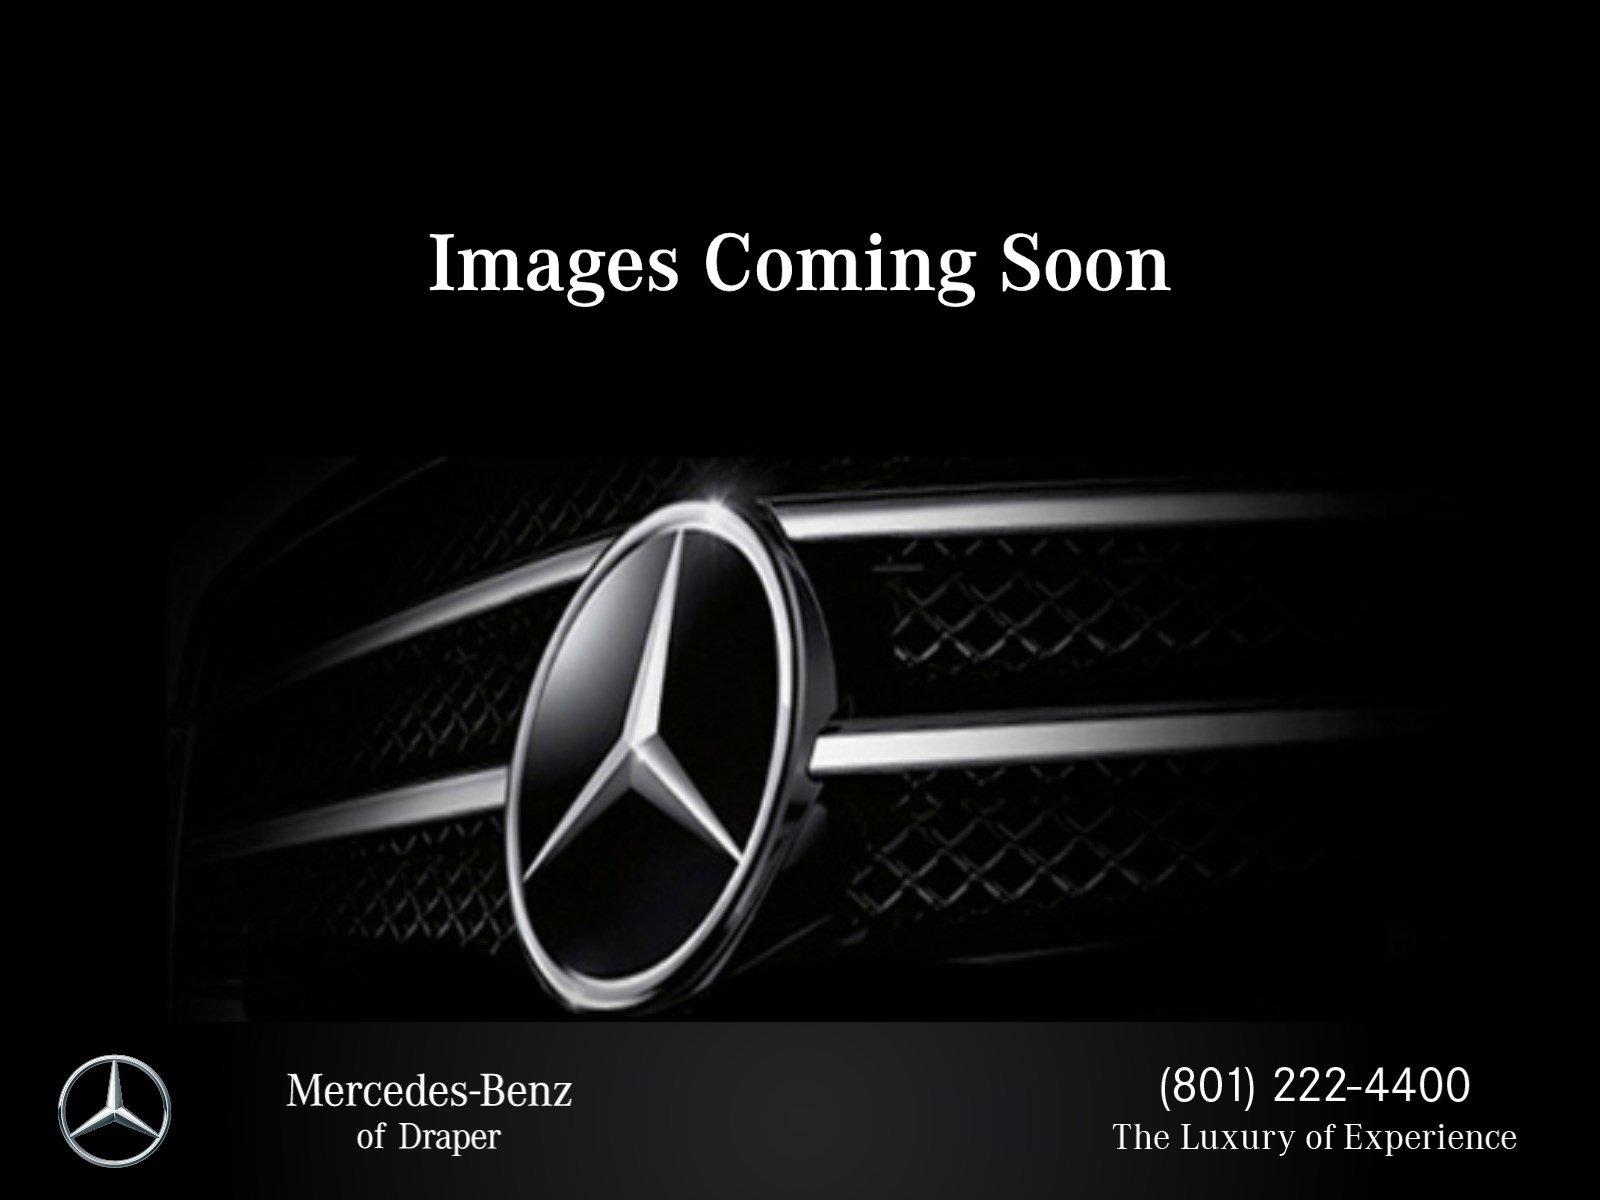 New 2020 Mercedes-Benz Sprinter Full-size Cargo Vans